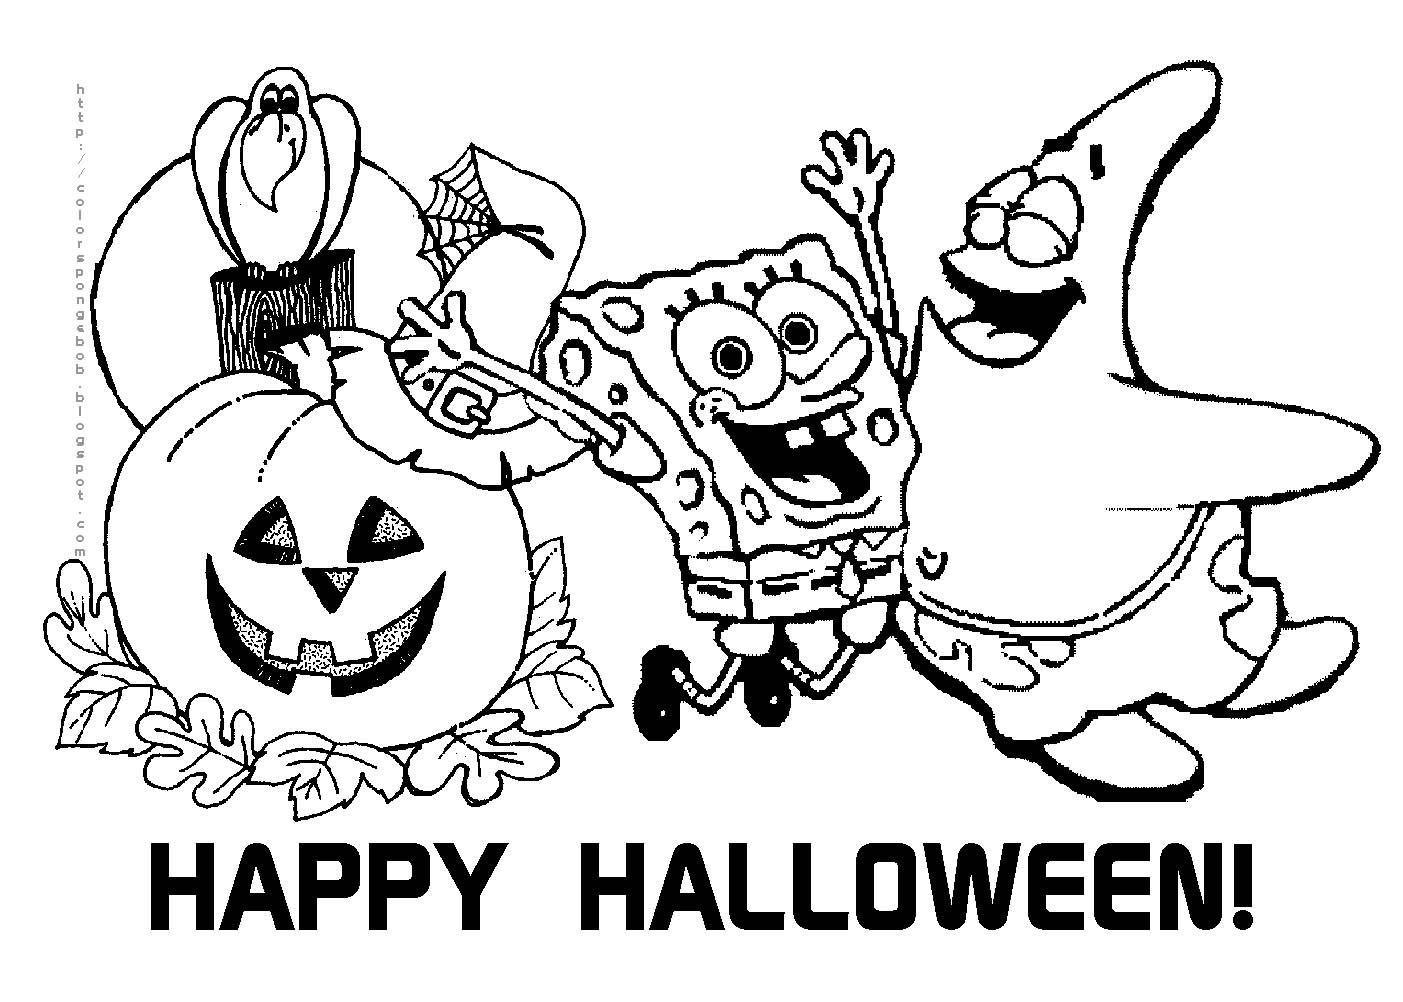 Free Printable Halloween Calendar   Halloween Spongebob Squarepants - Free Printable Halloween Coloring Pages